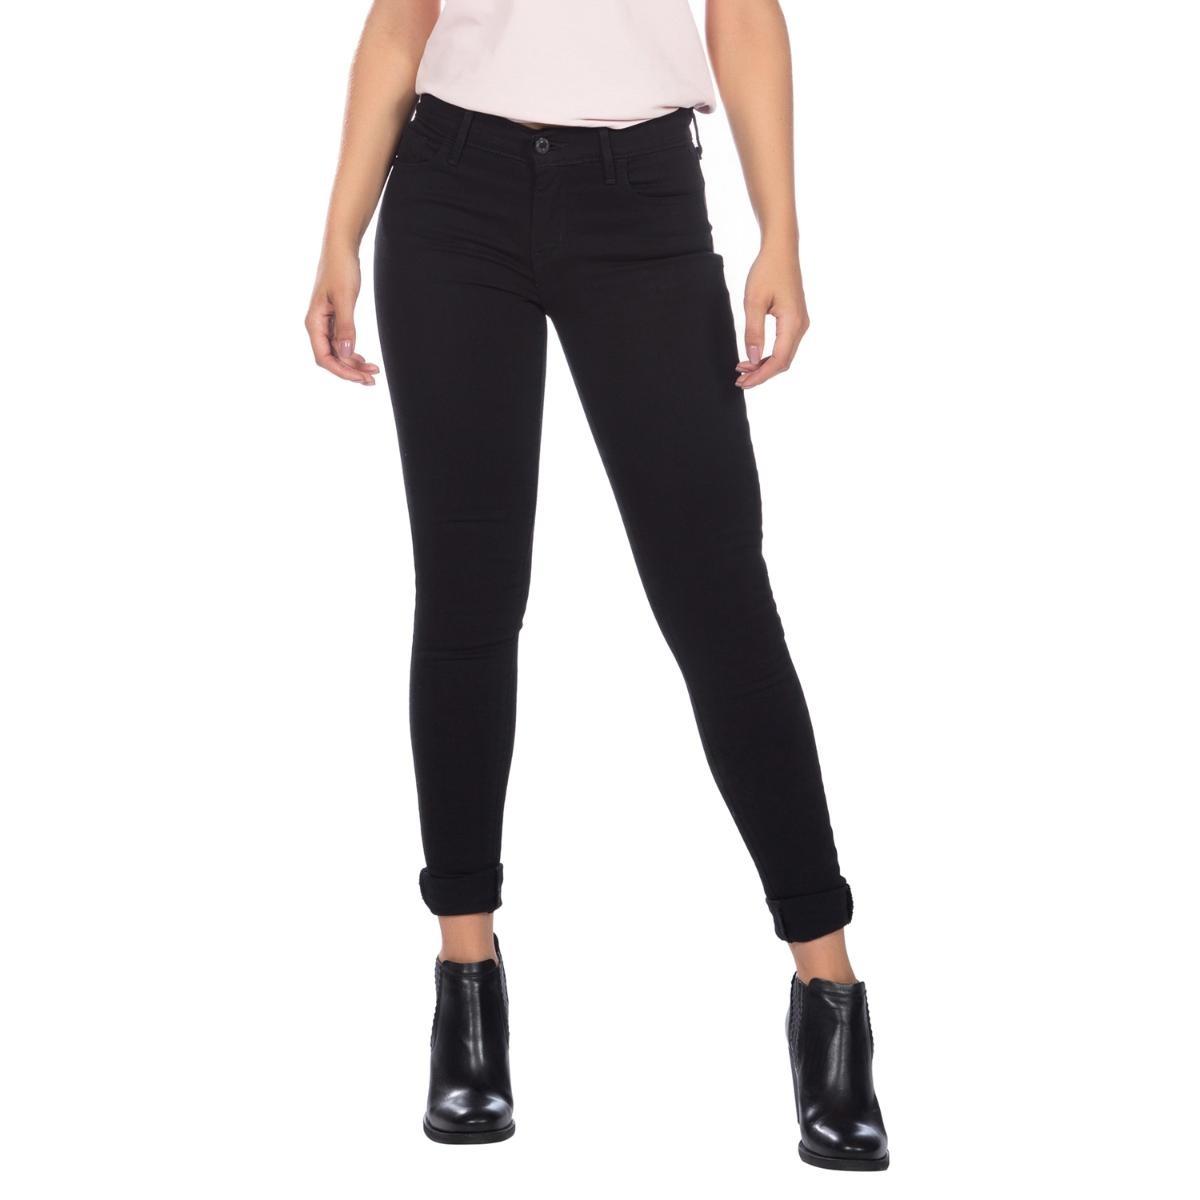 calça jeans levis feminina 710 super skinny preta. Carregando zoom. 7aad39e998c